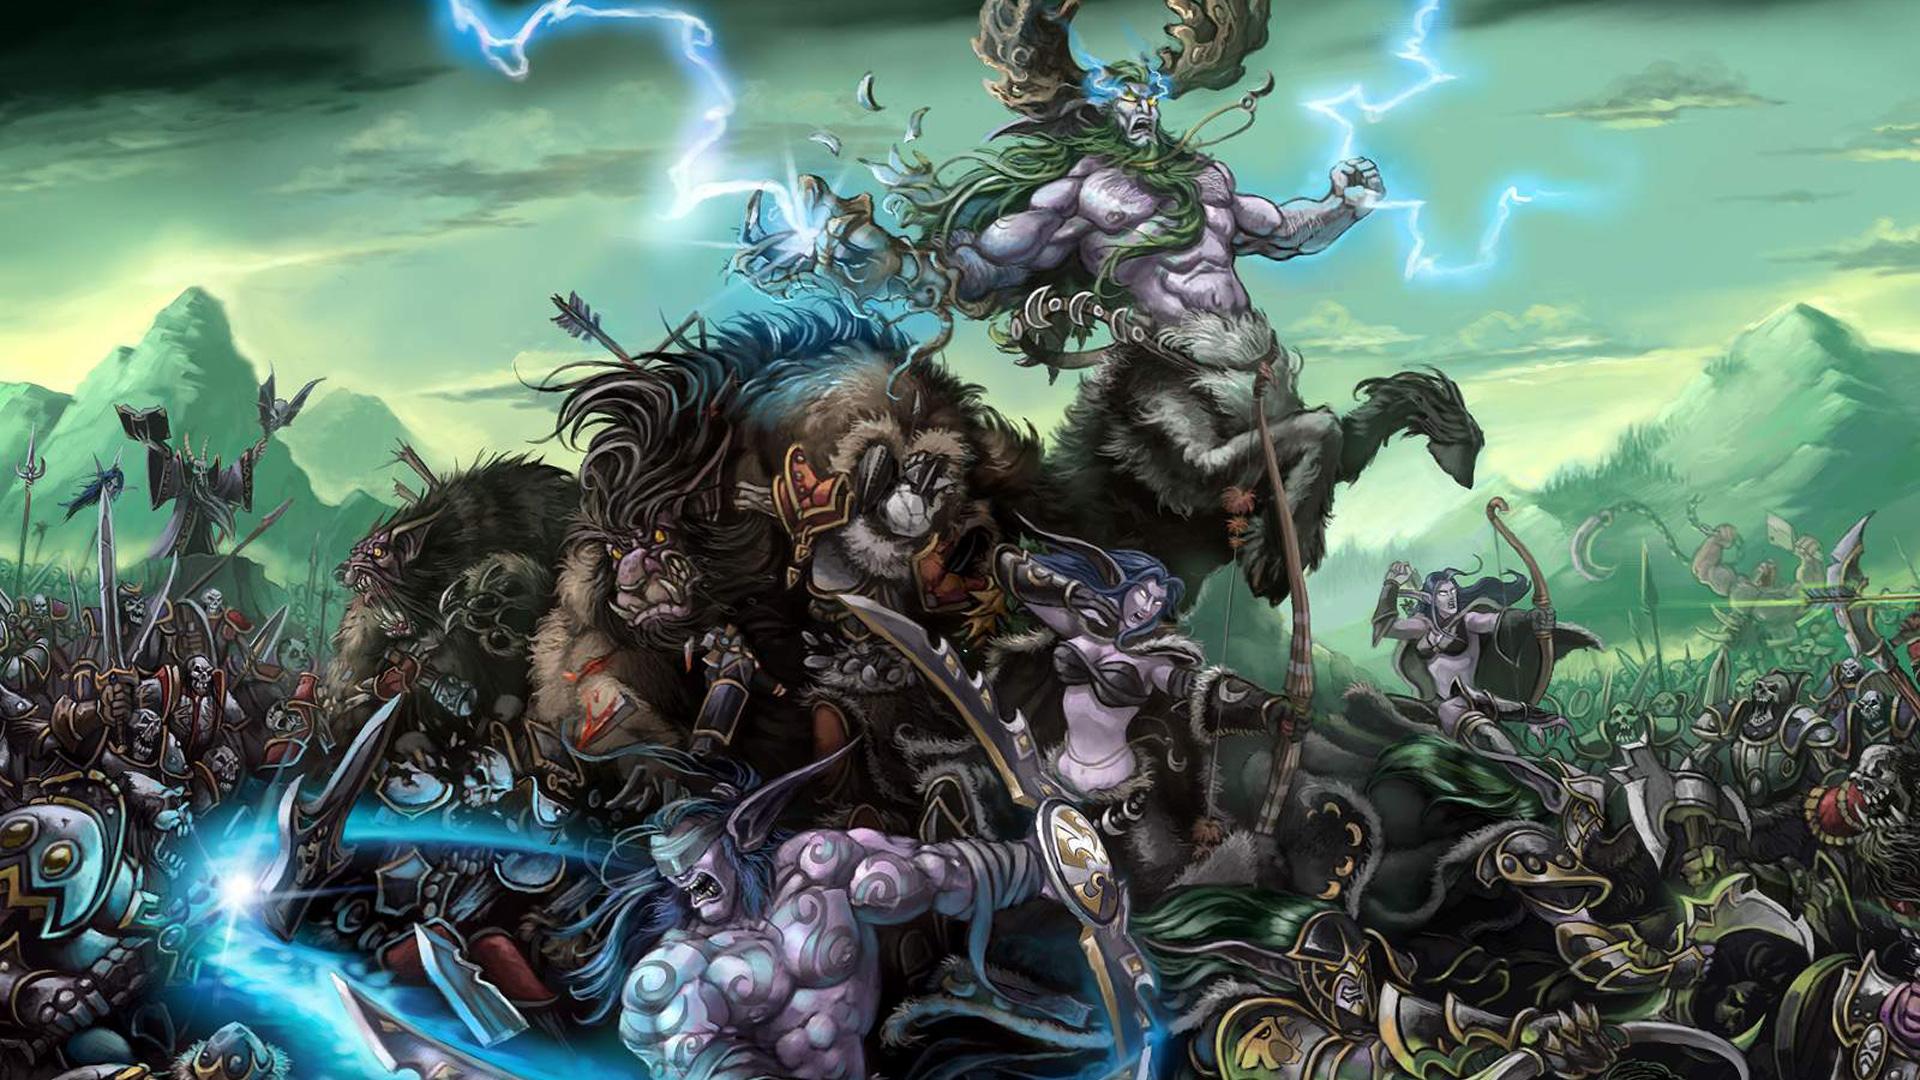 Warcraft 3 wallpaper 2